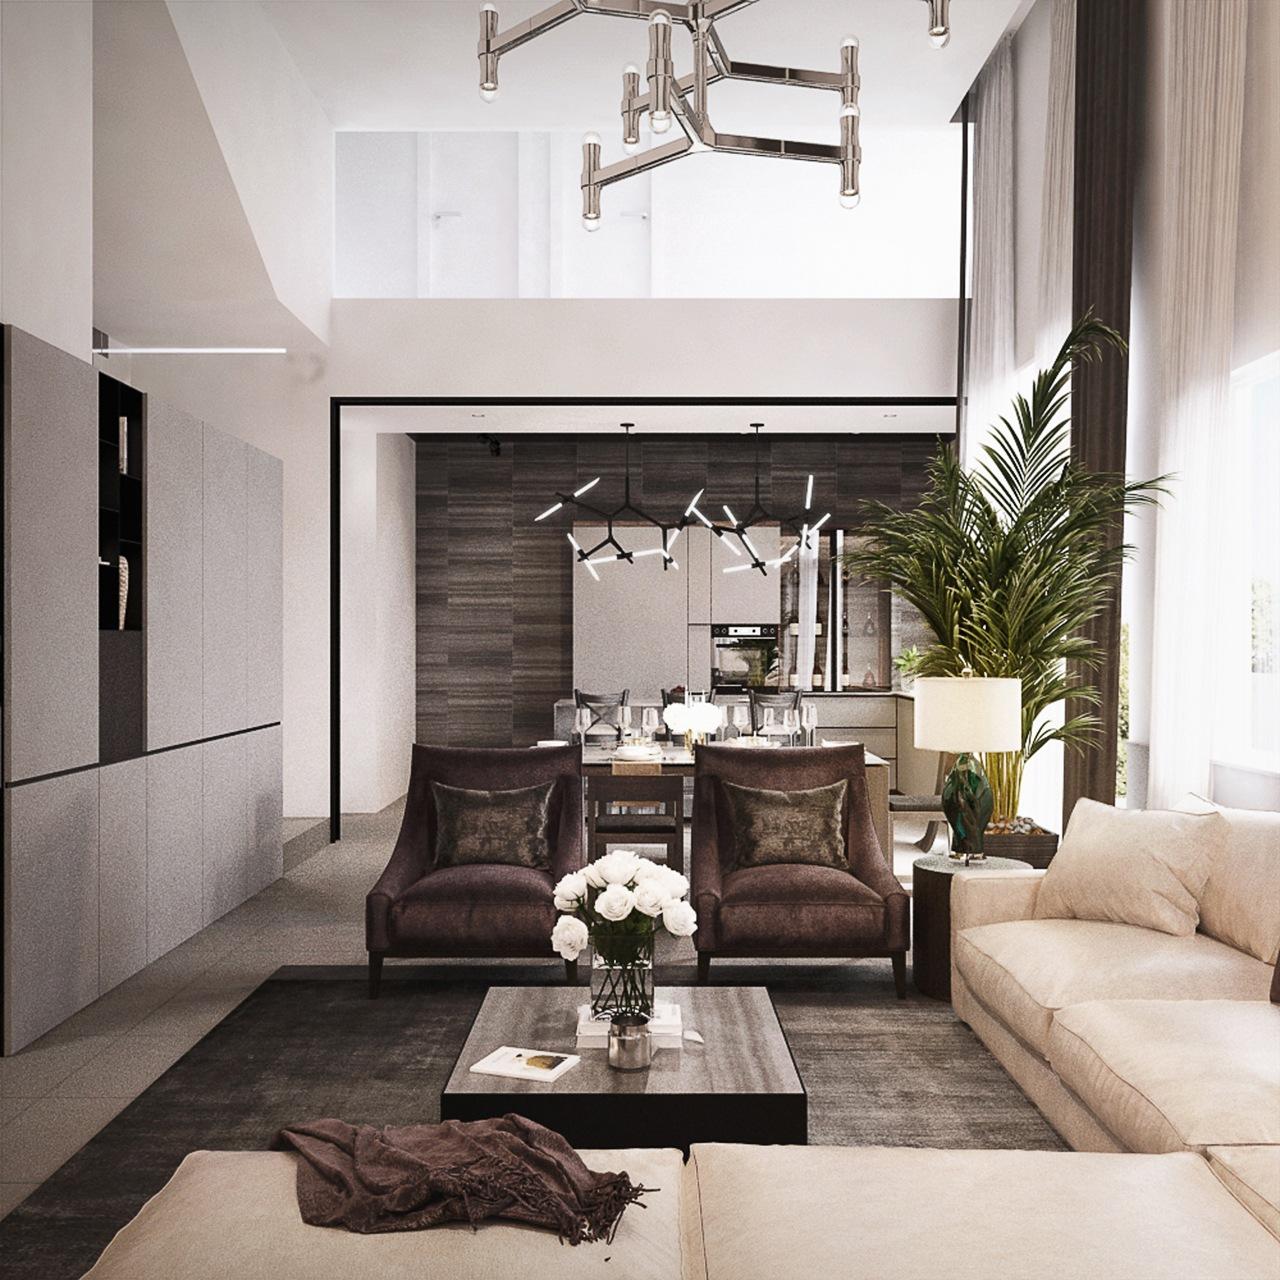 Interior Design SA65 Semi-D Penang Malaysia Living Room